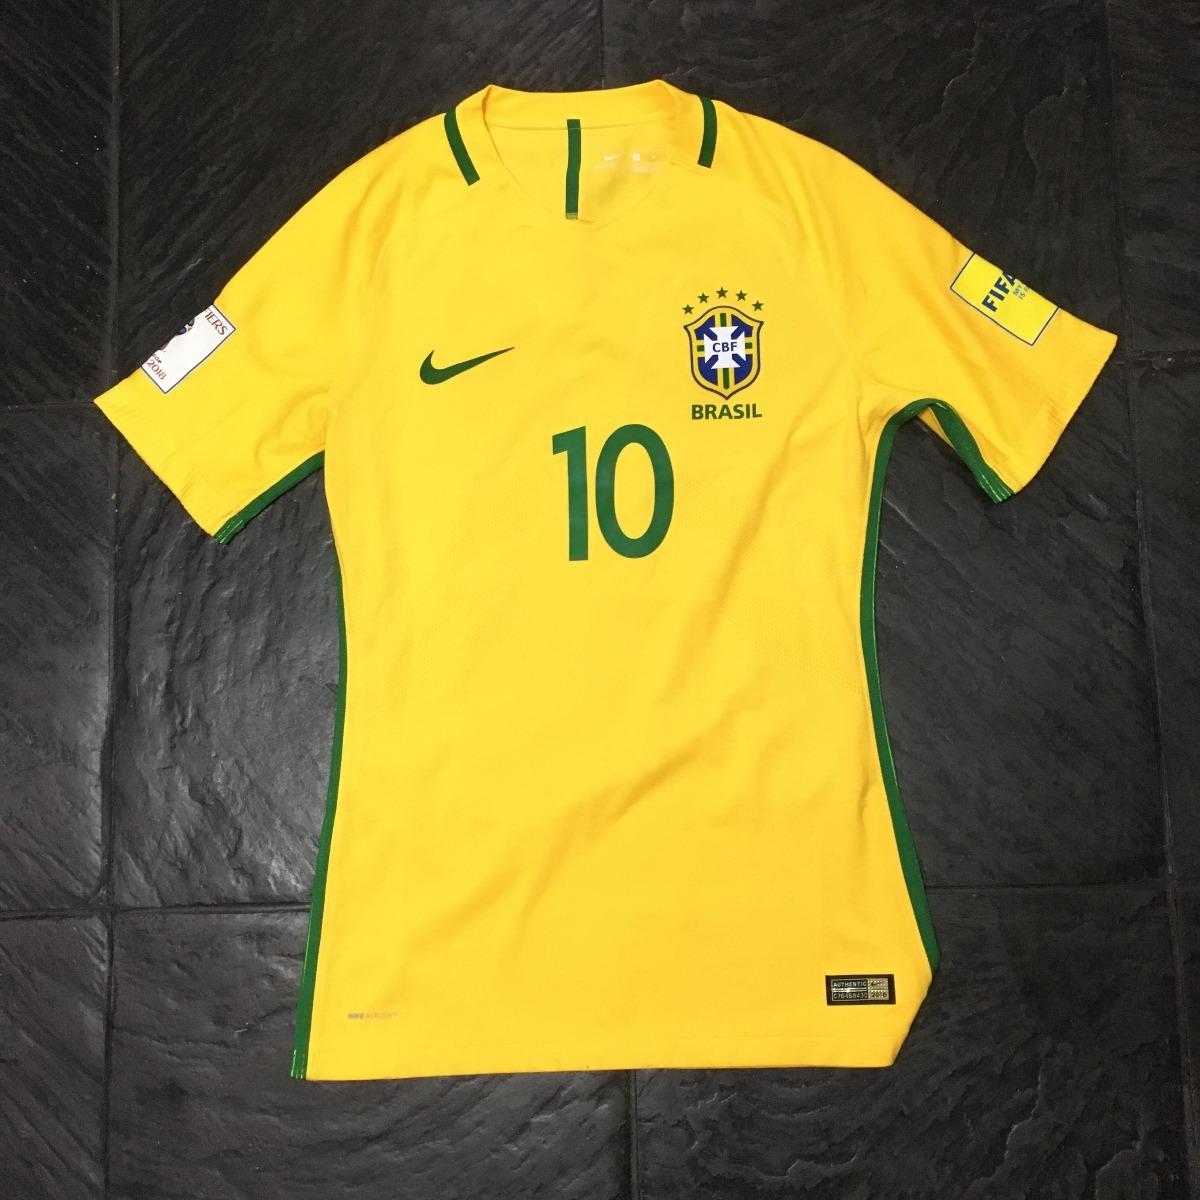 0fcf3336a6a49 camiseta brasil 2016 2017 titular eliminatorias  10 neymar. Cargando zoom.